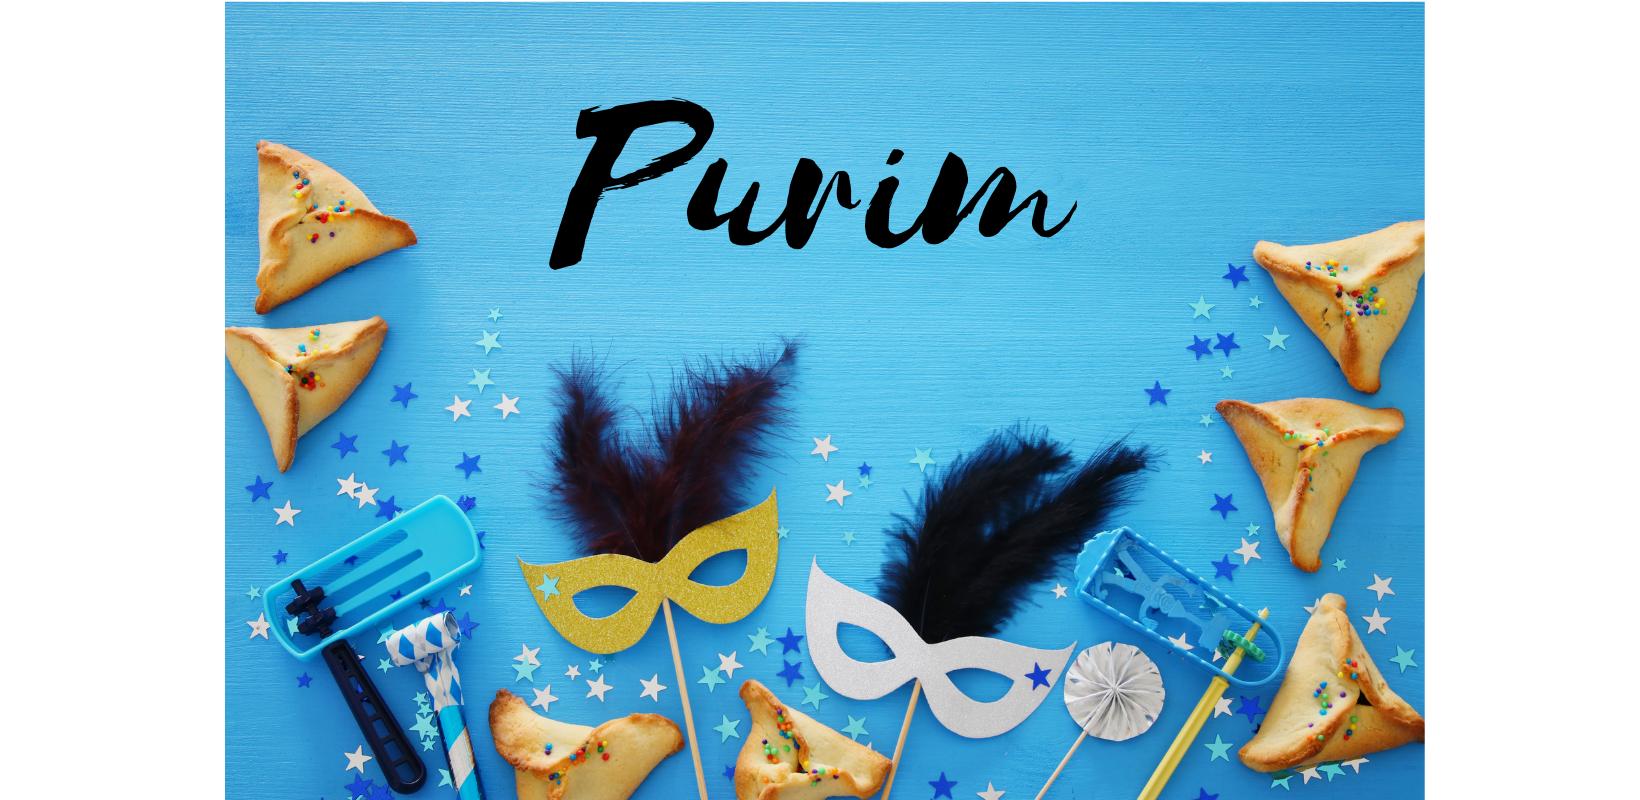 Purim celebration image